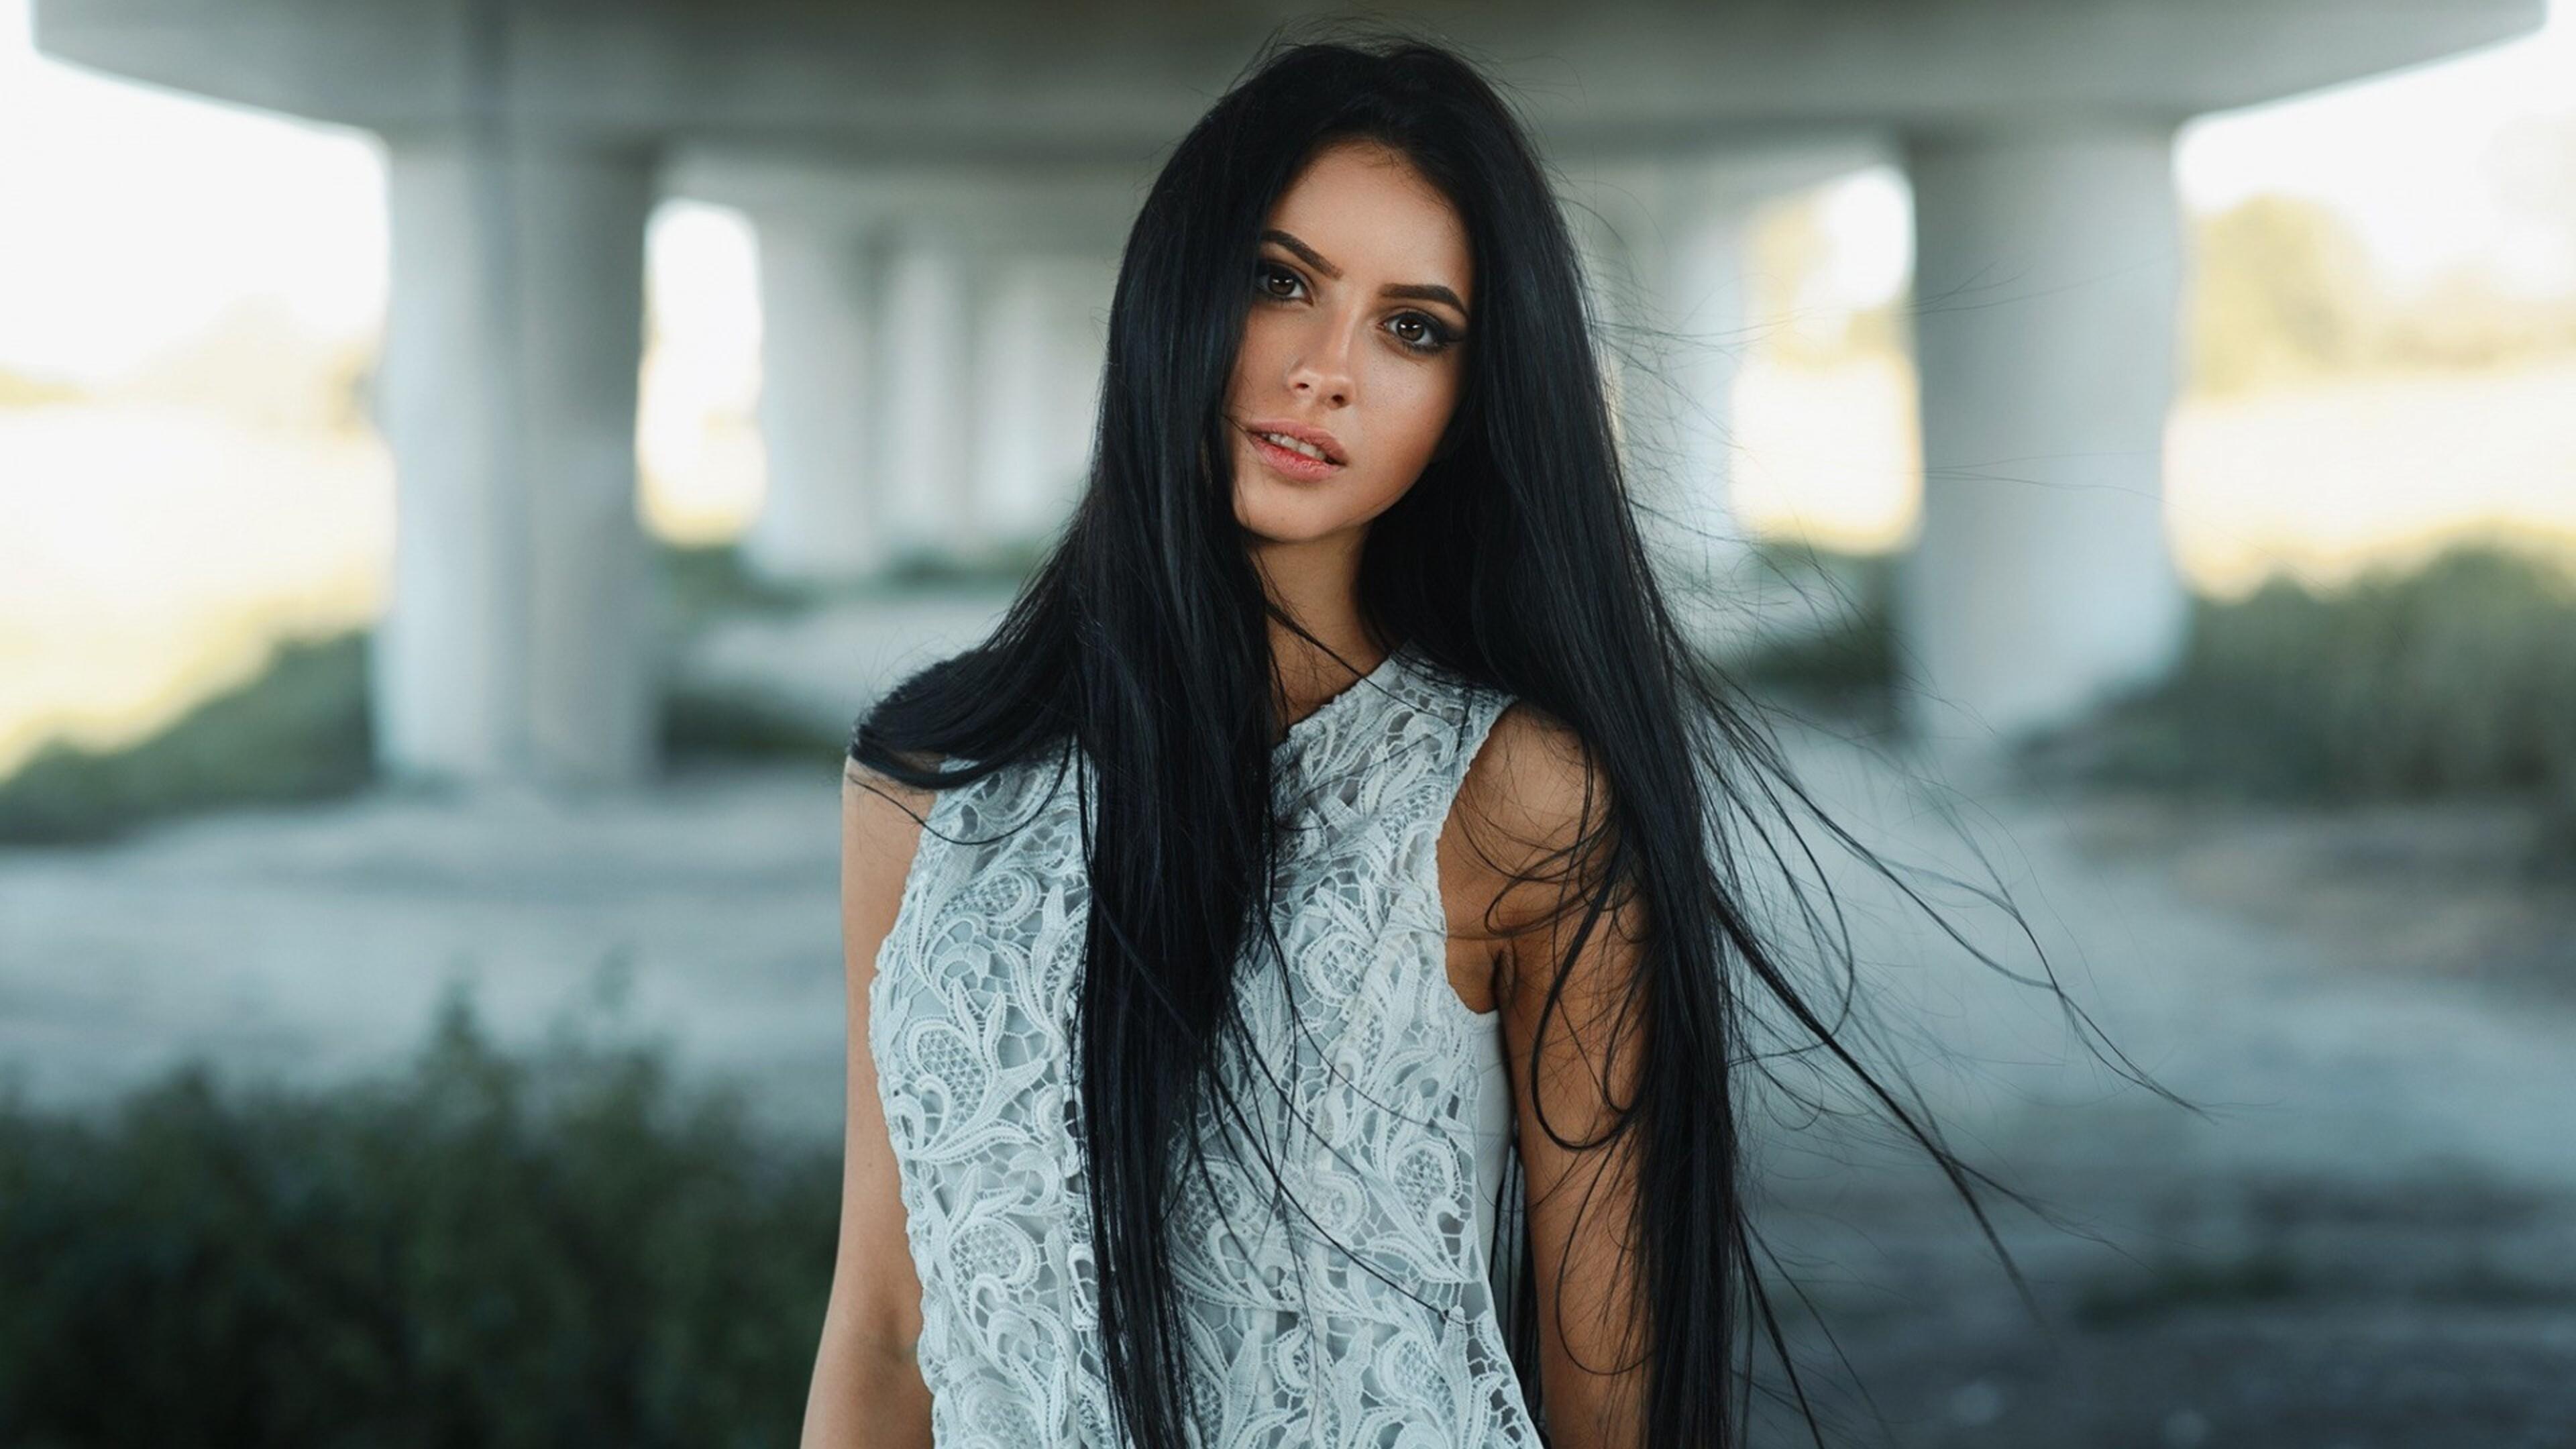 darina-gorgeous-pic.jpg